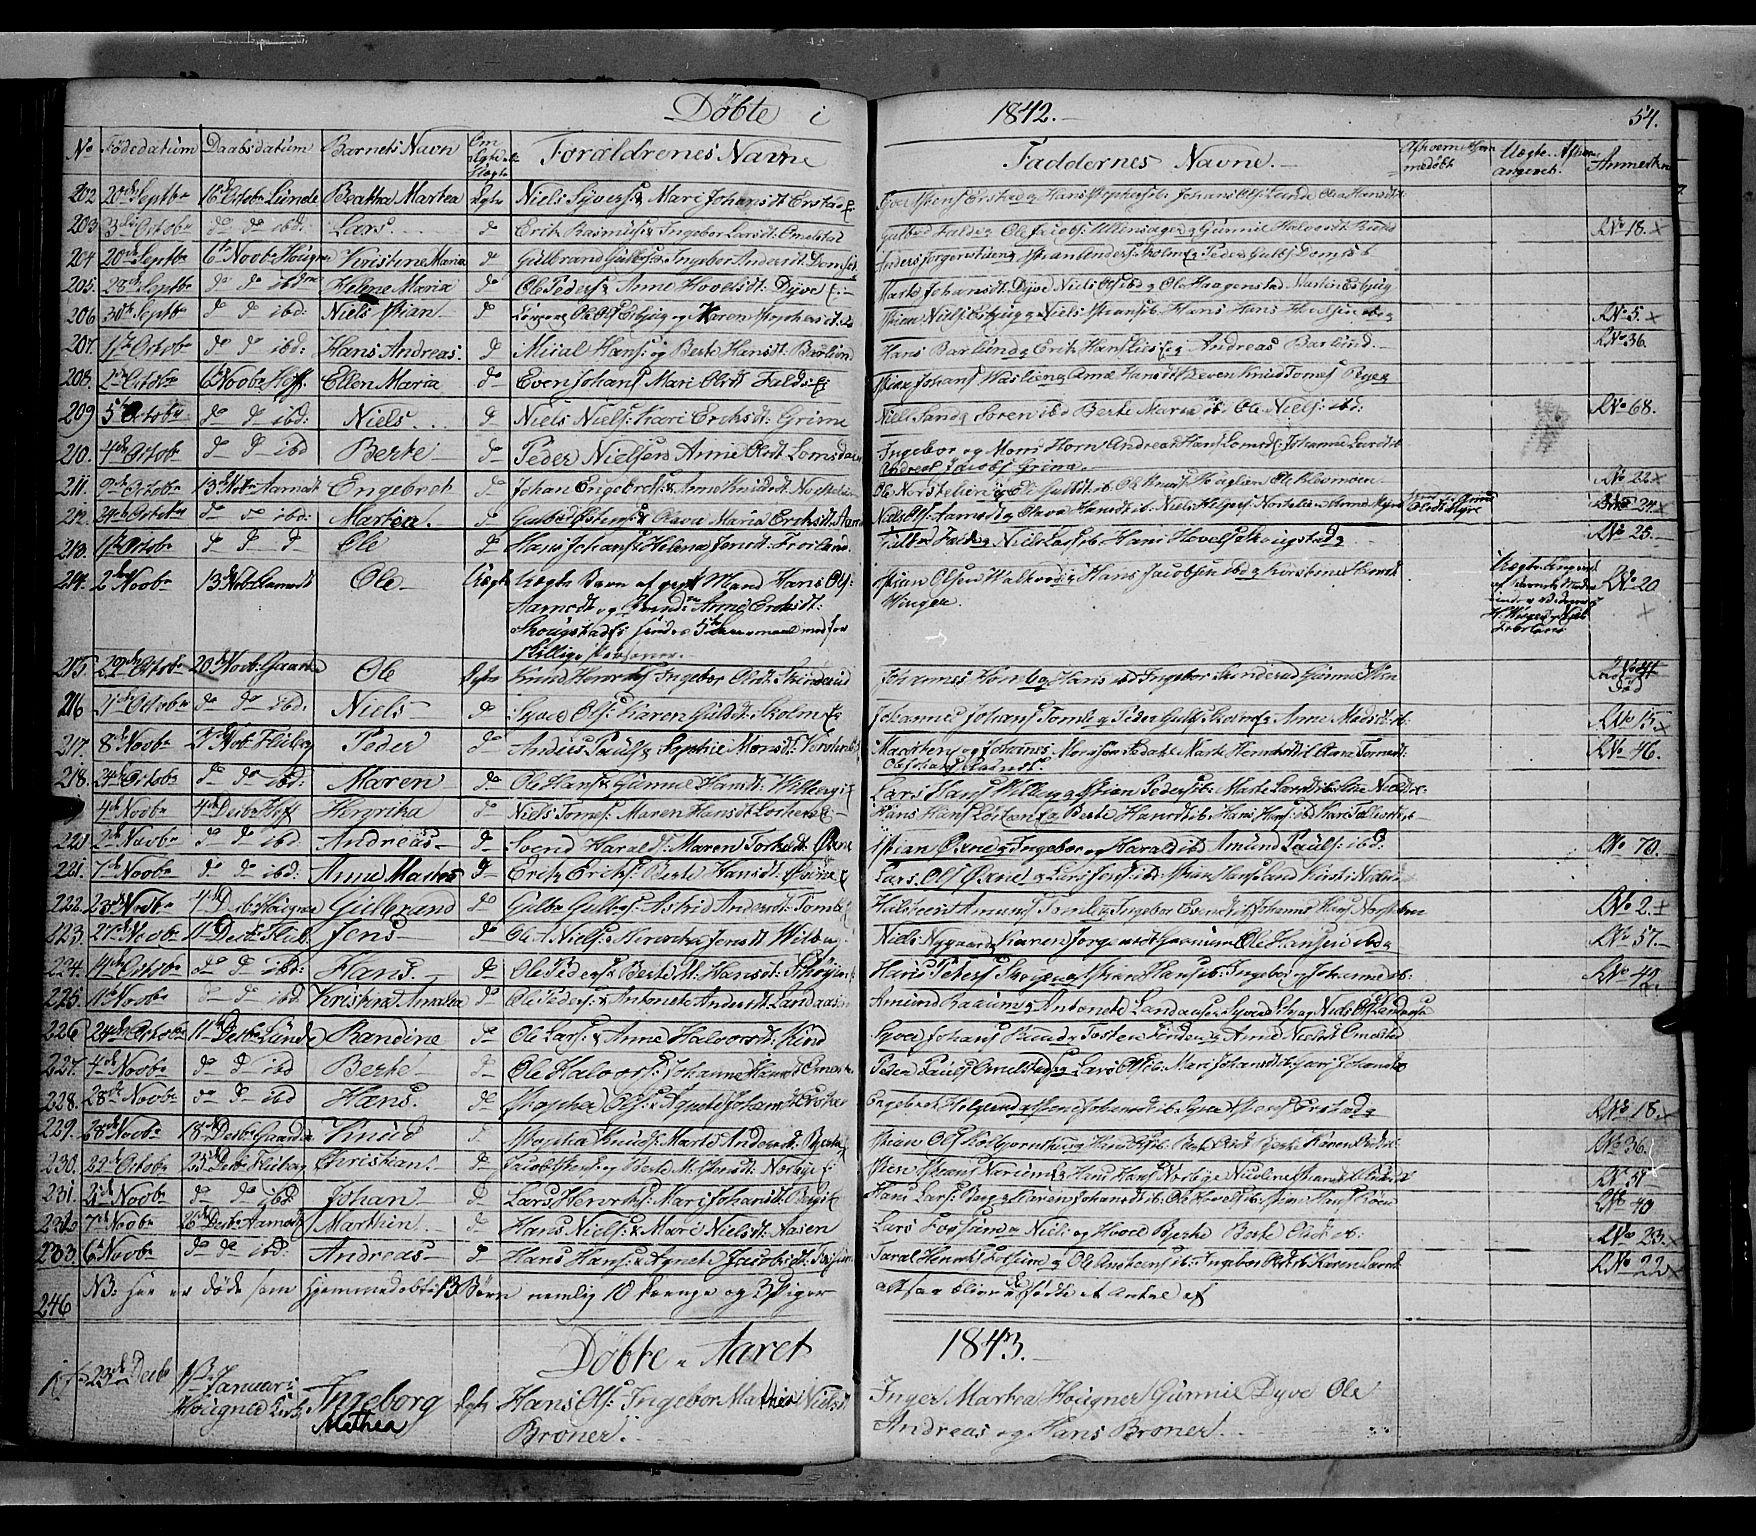 SAH, Land prestekontor, Klokkerbok nr. 2, 1833-1849, s. 54